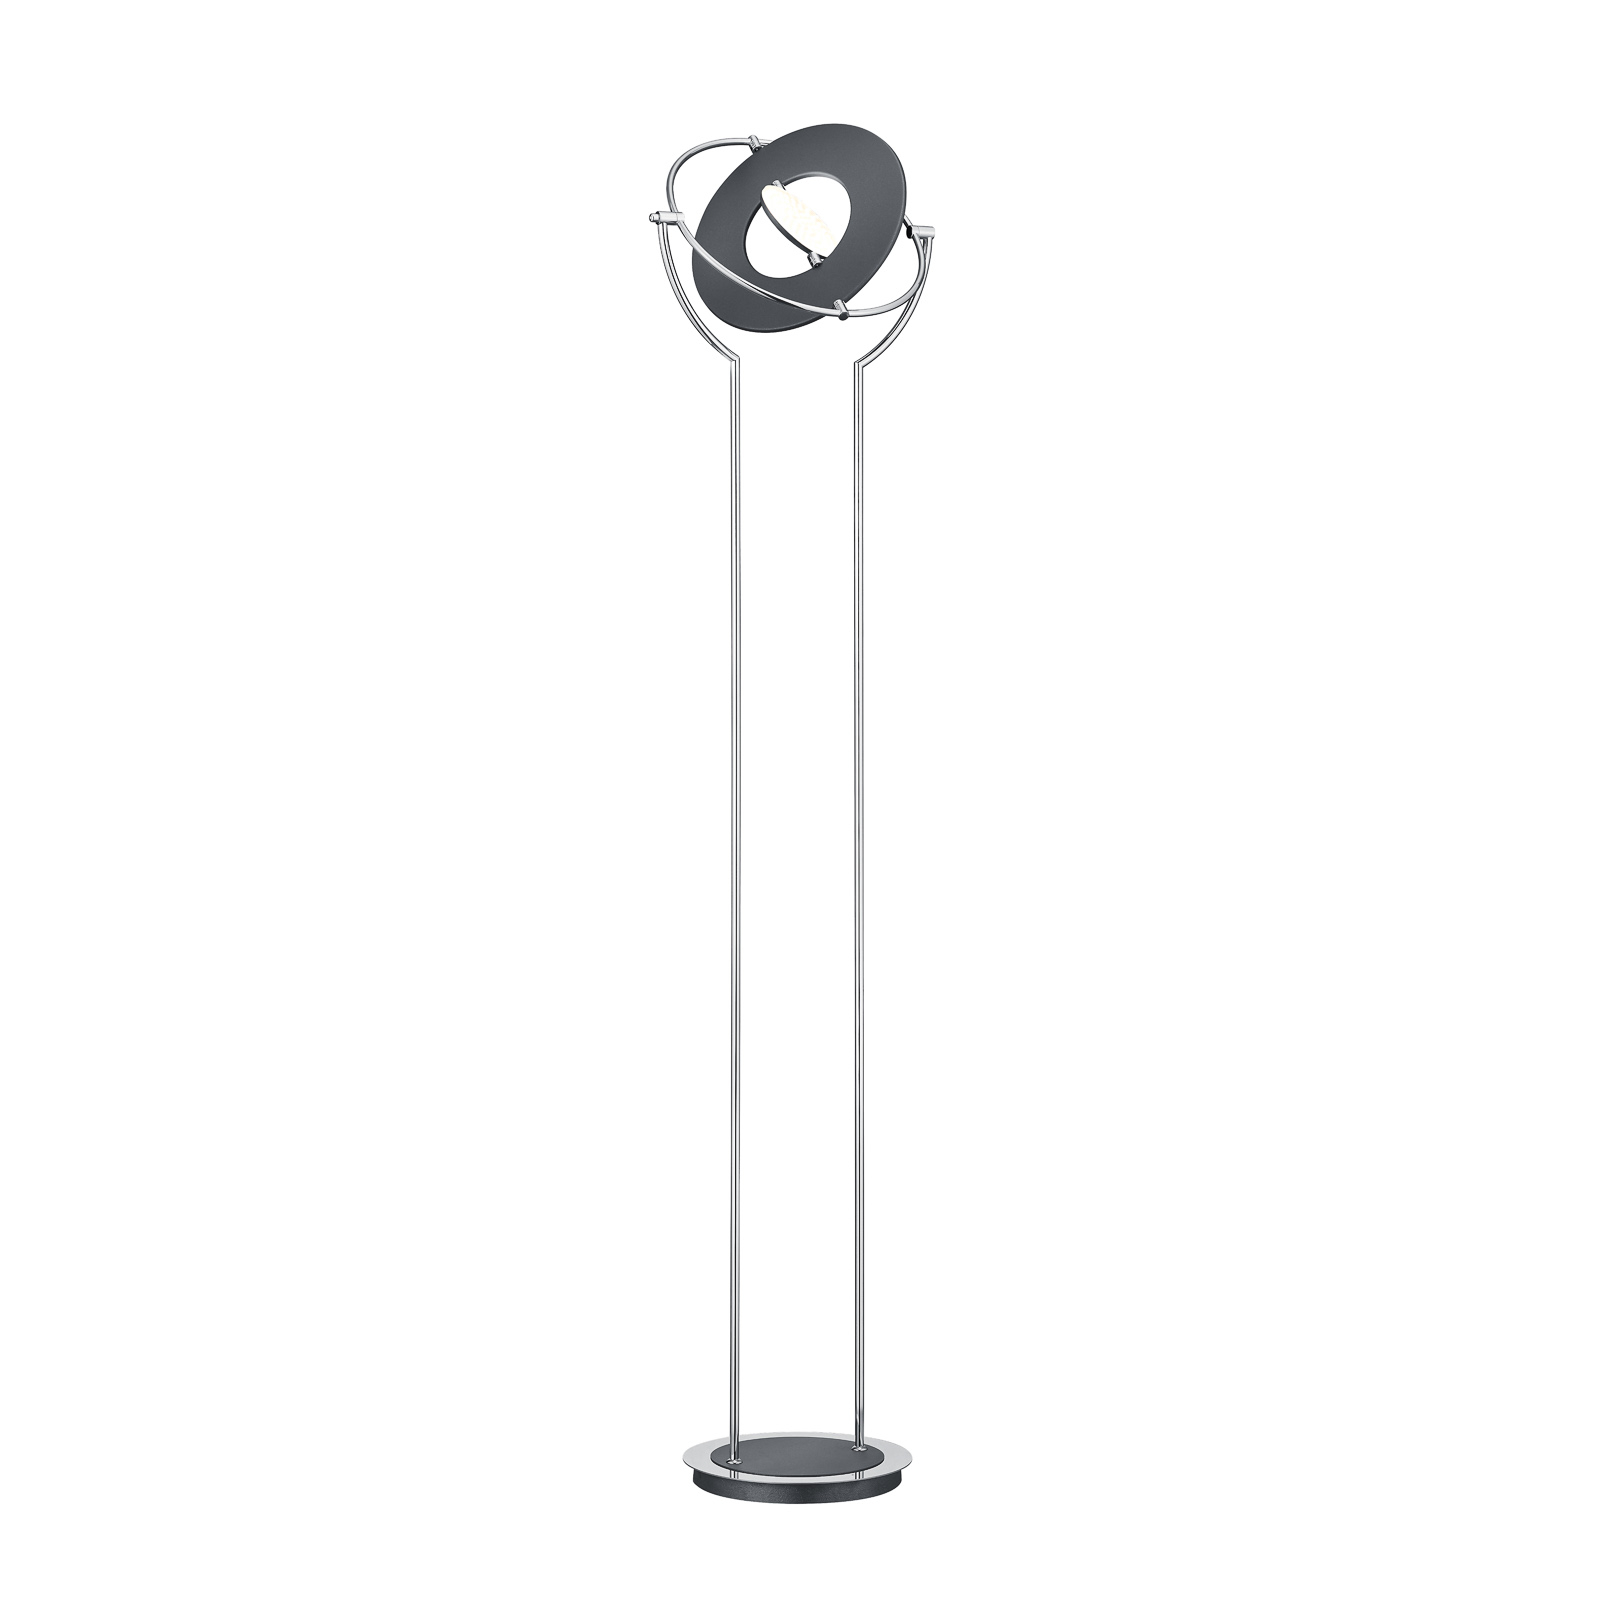 BANKAMP Astoria LED-vloerlamp, ZigBee chroom grijs